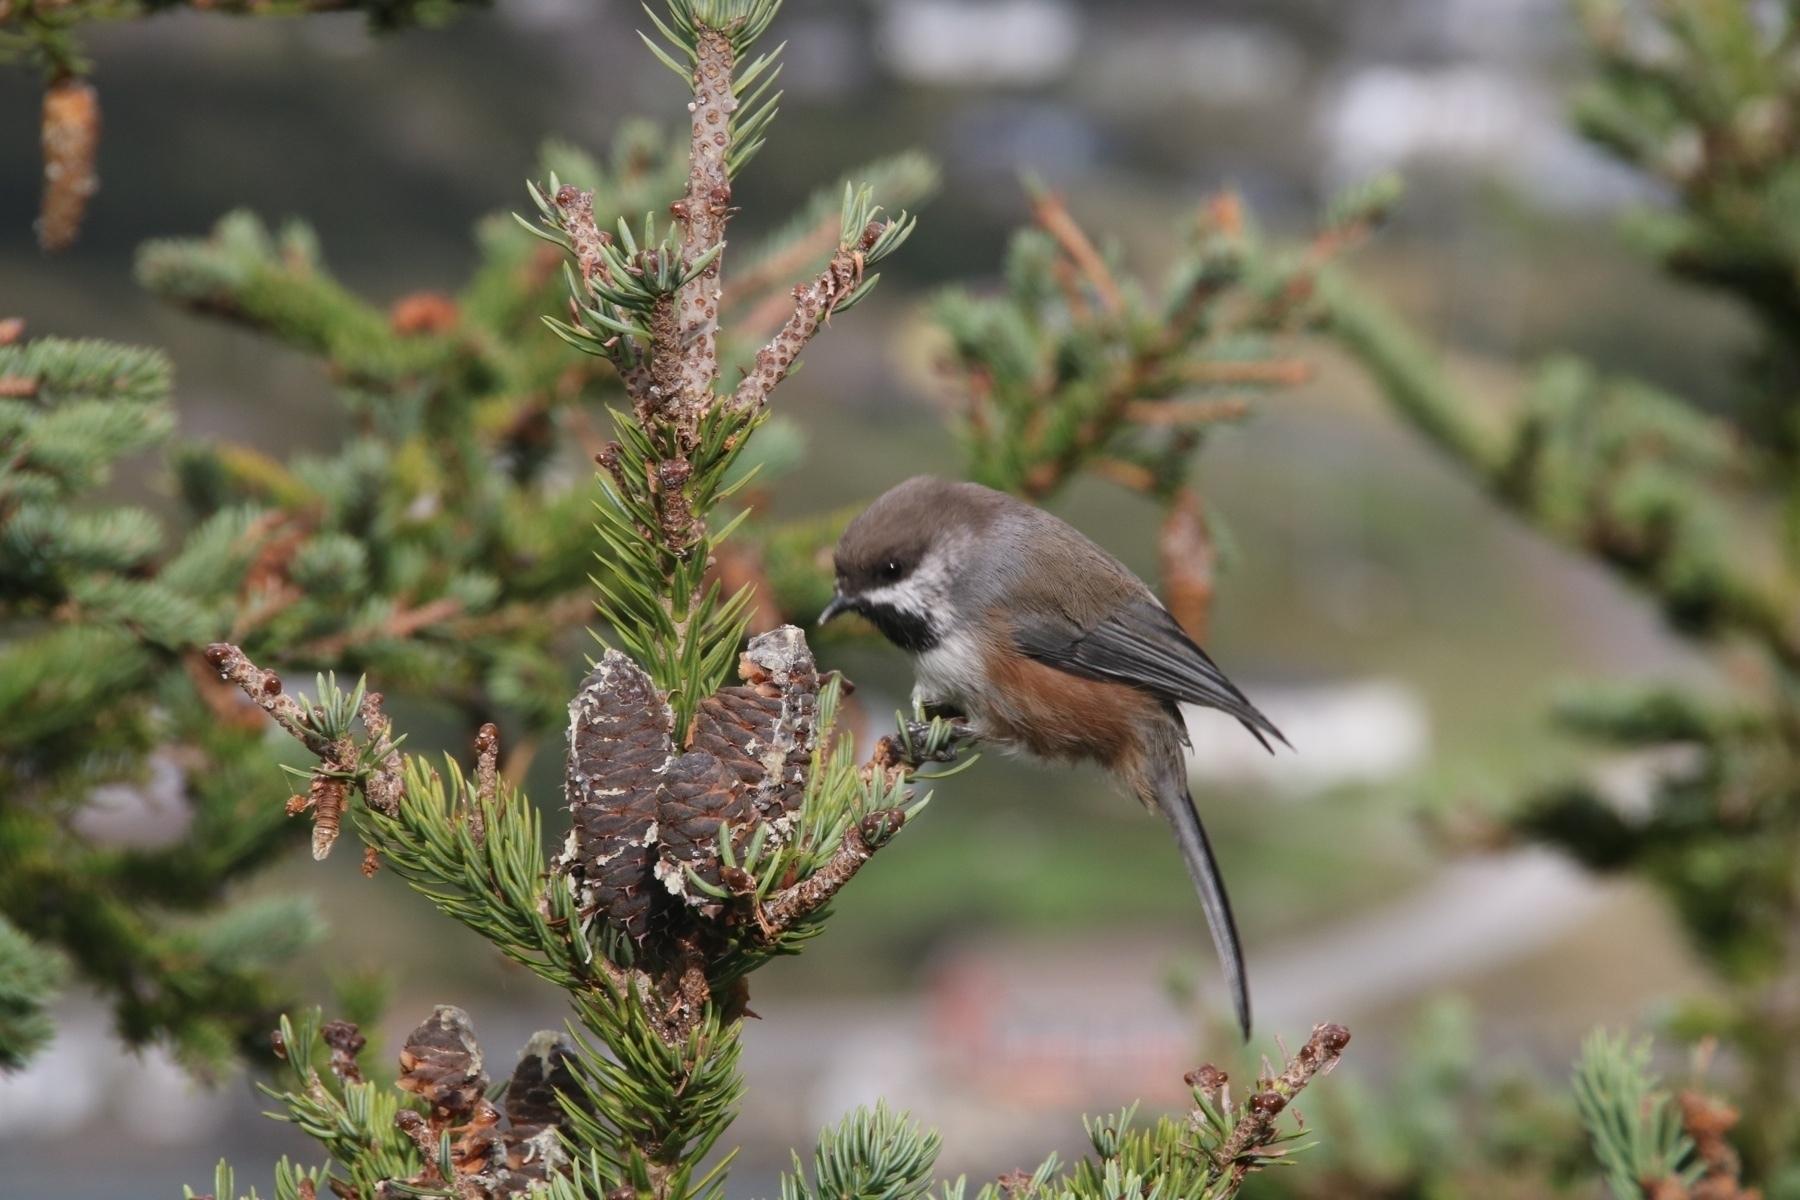 small bird eating from a fir cone